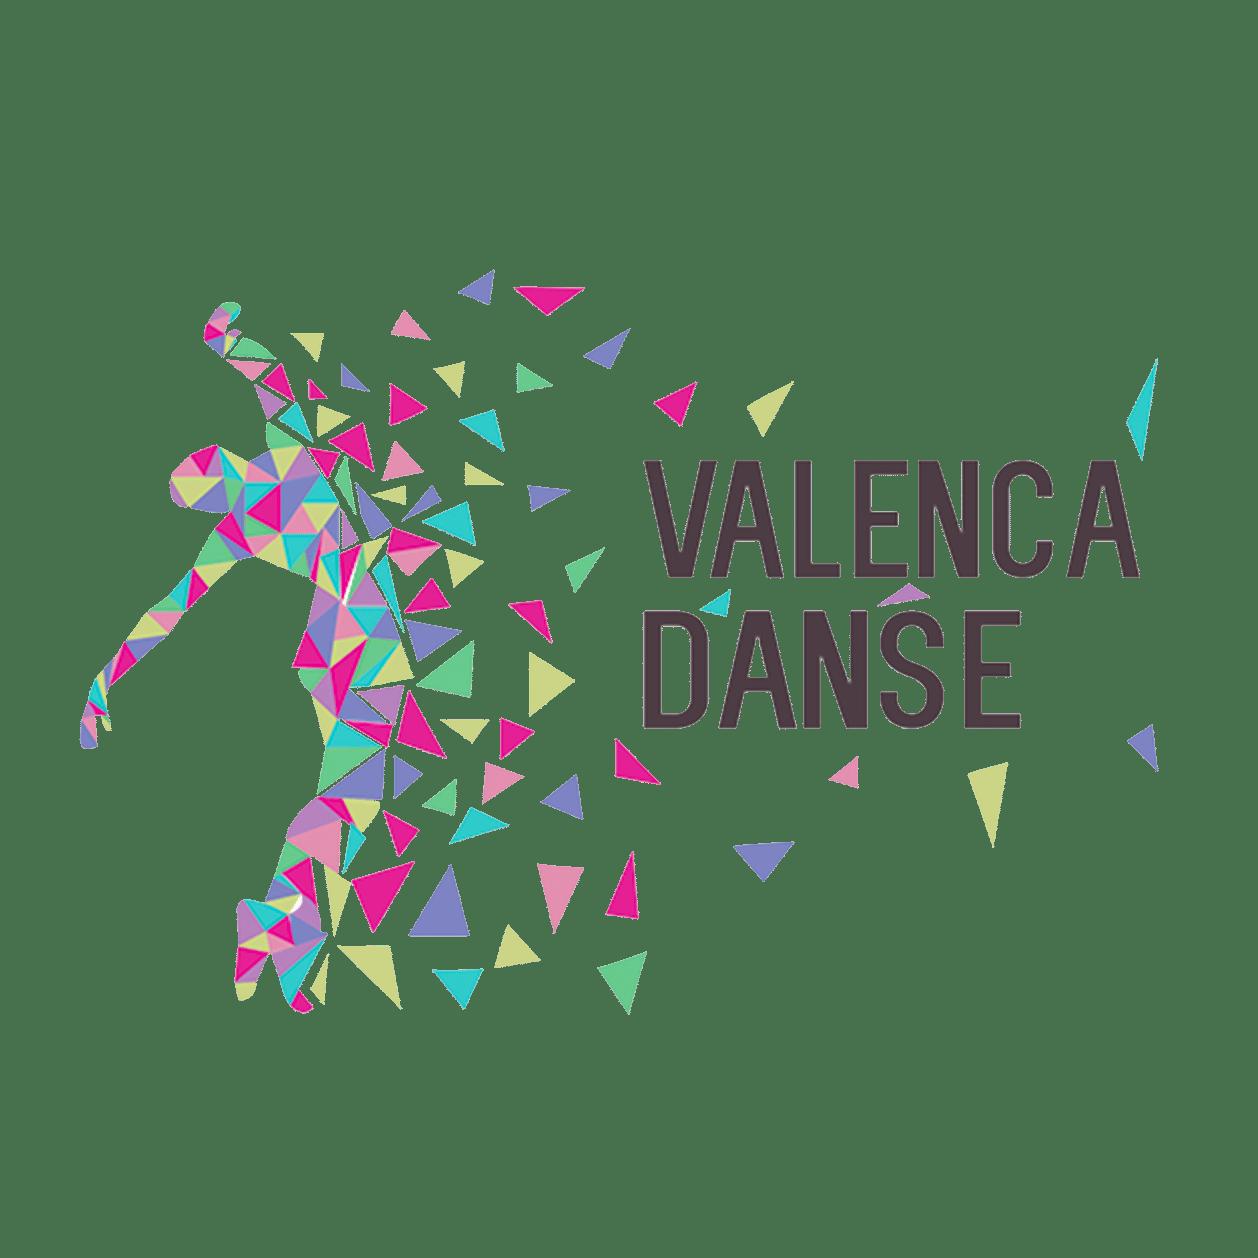 Logo Valenca danse